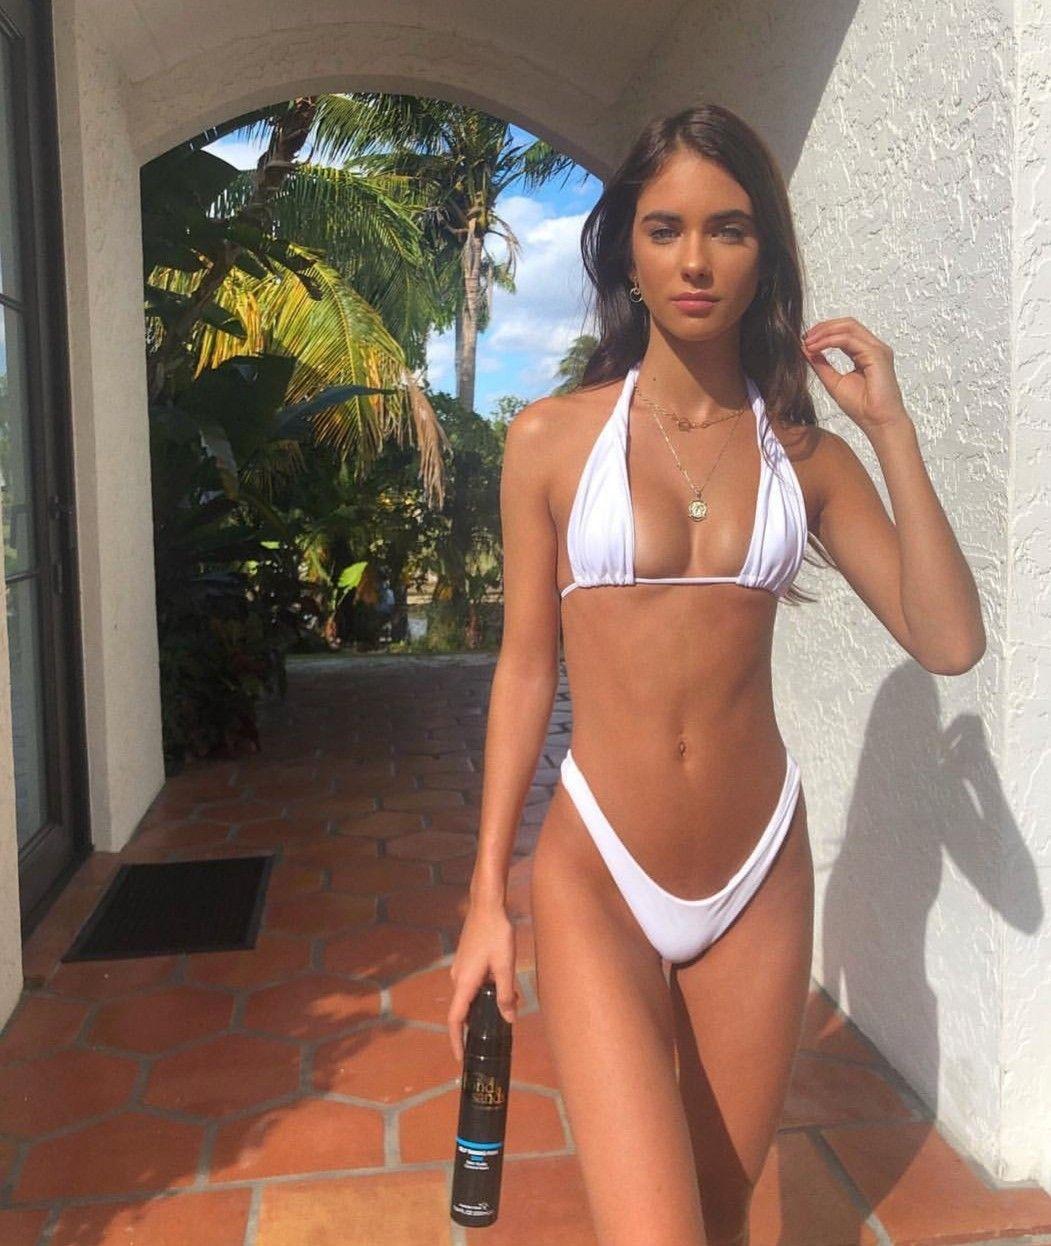 Cleavage Renee Bourke nude photos 2019